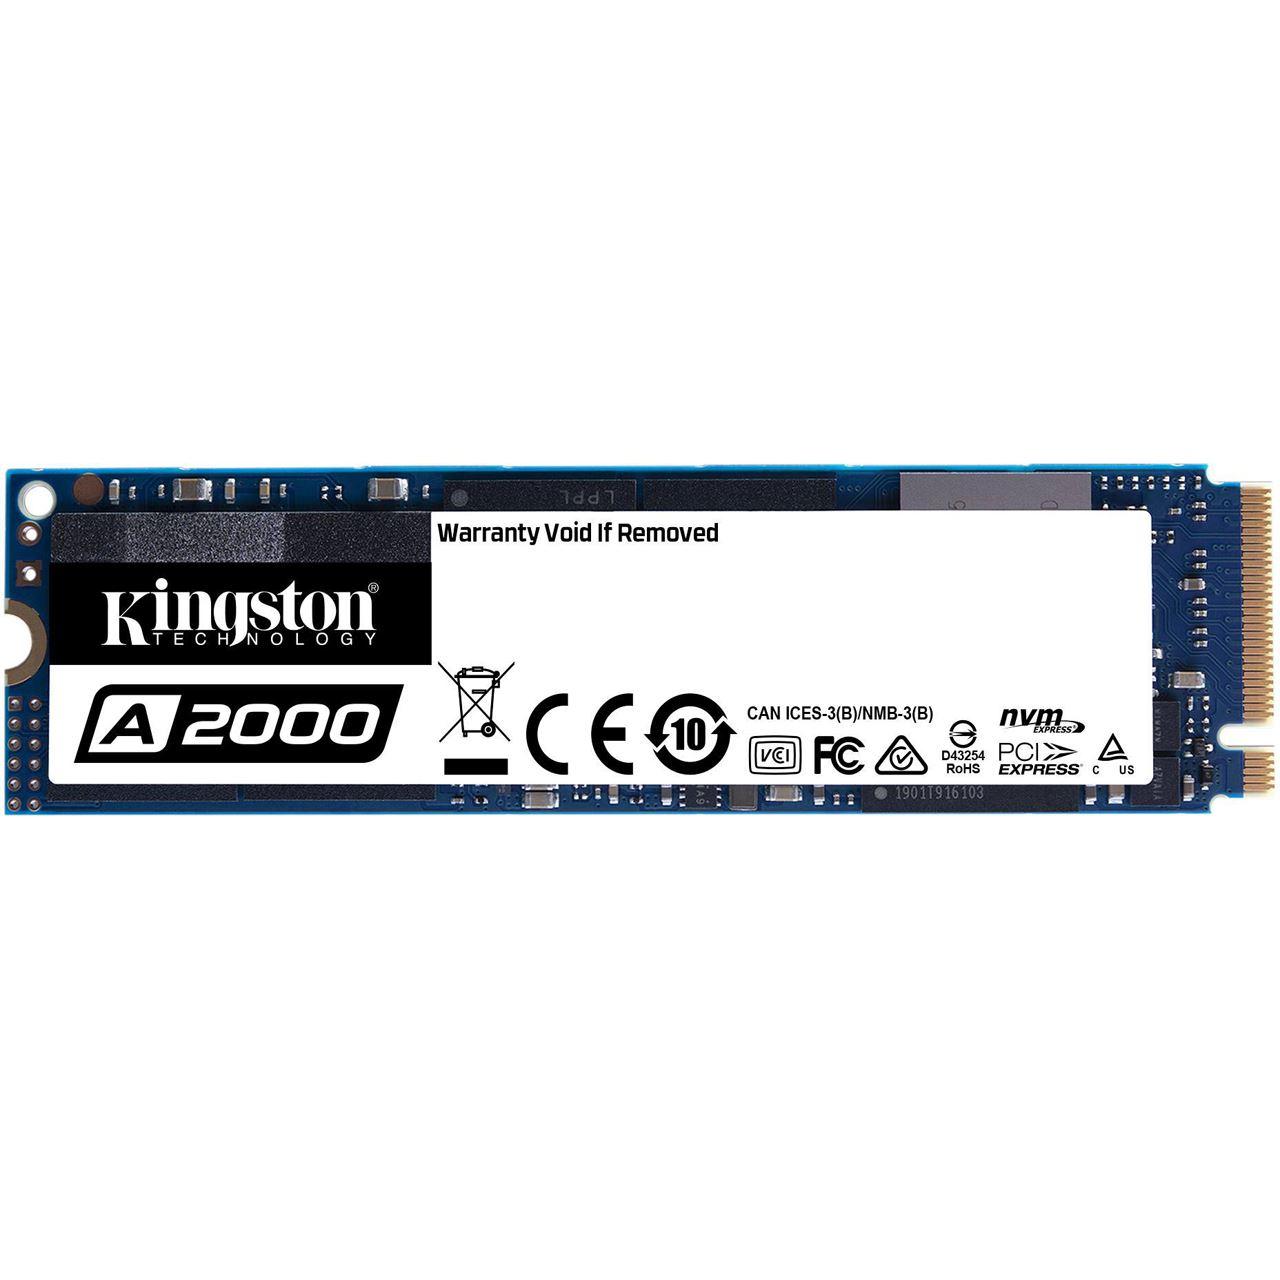 DAMN!-Deals Kingston SSD A2000 1TB Read:2200 MB/s Write:2000 MB/s